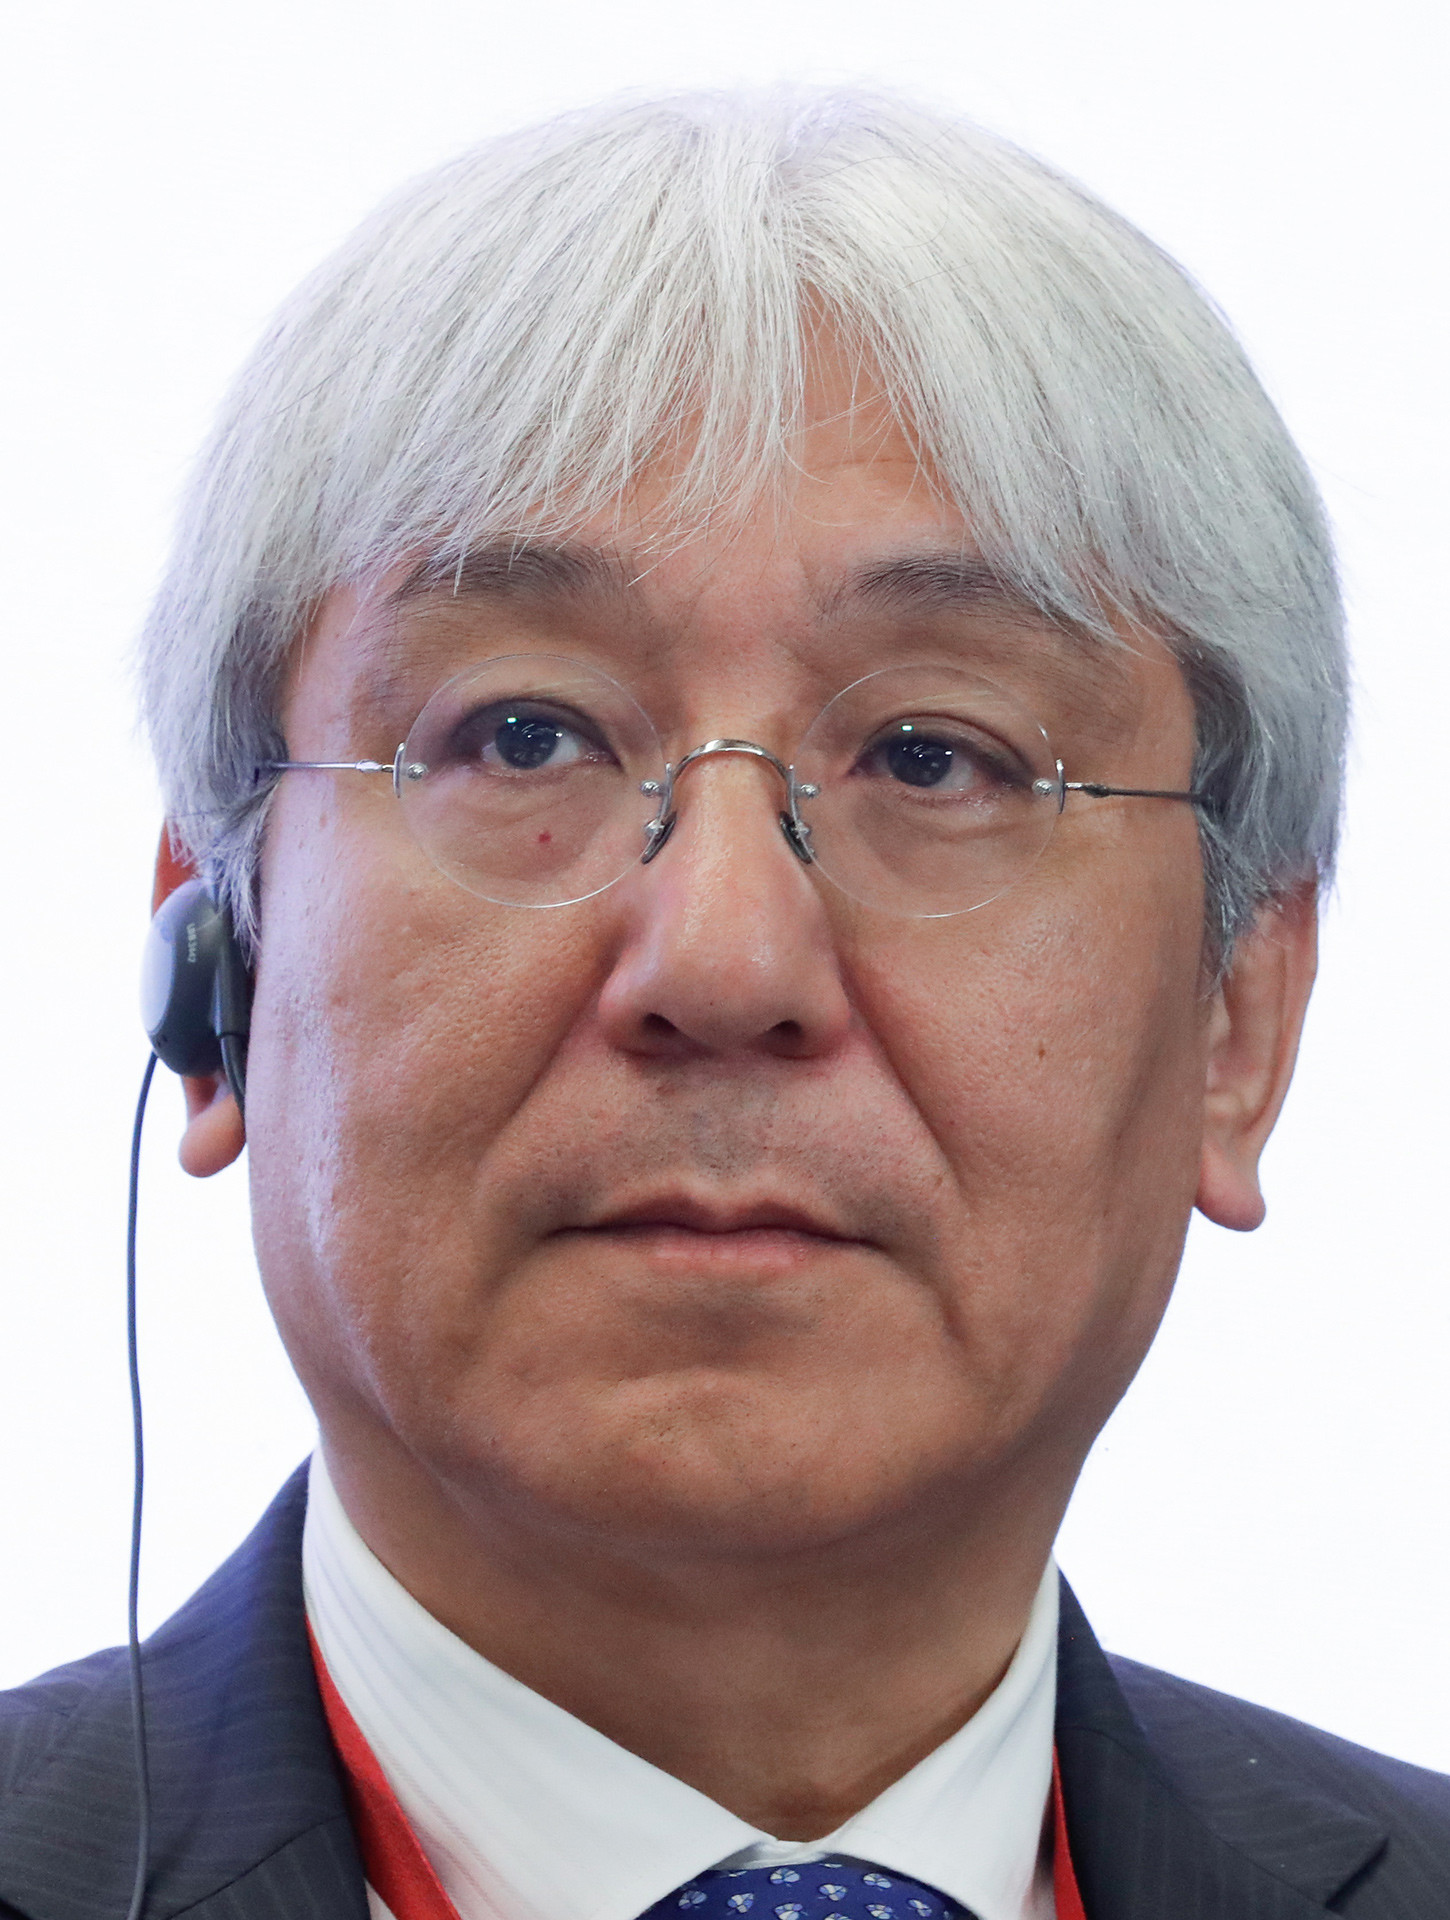 Vicepresidente ejecutivo de Japan Tobacco Inc, Mutsuo Iwai